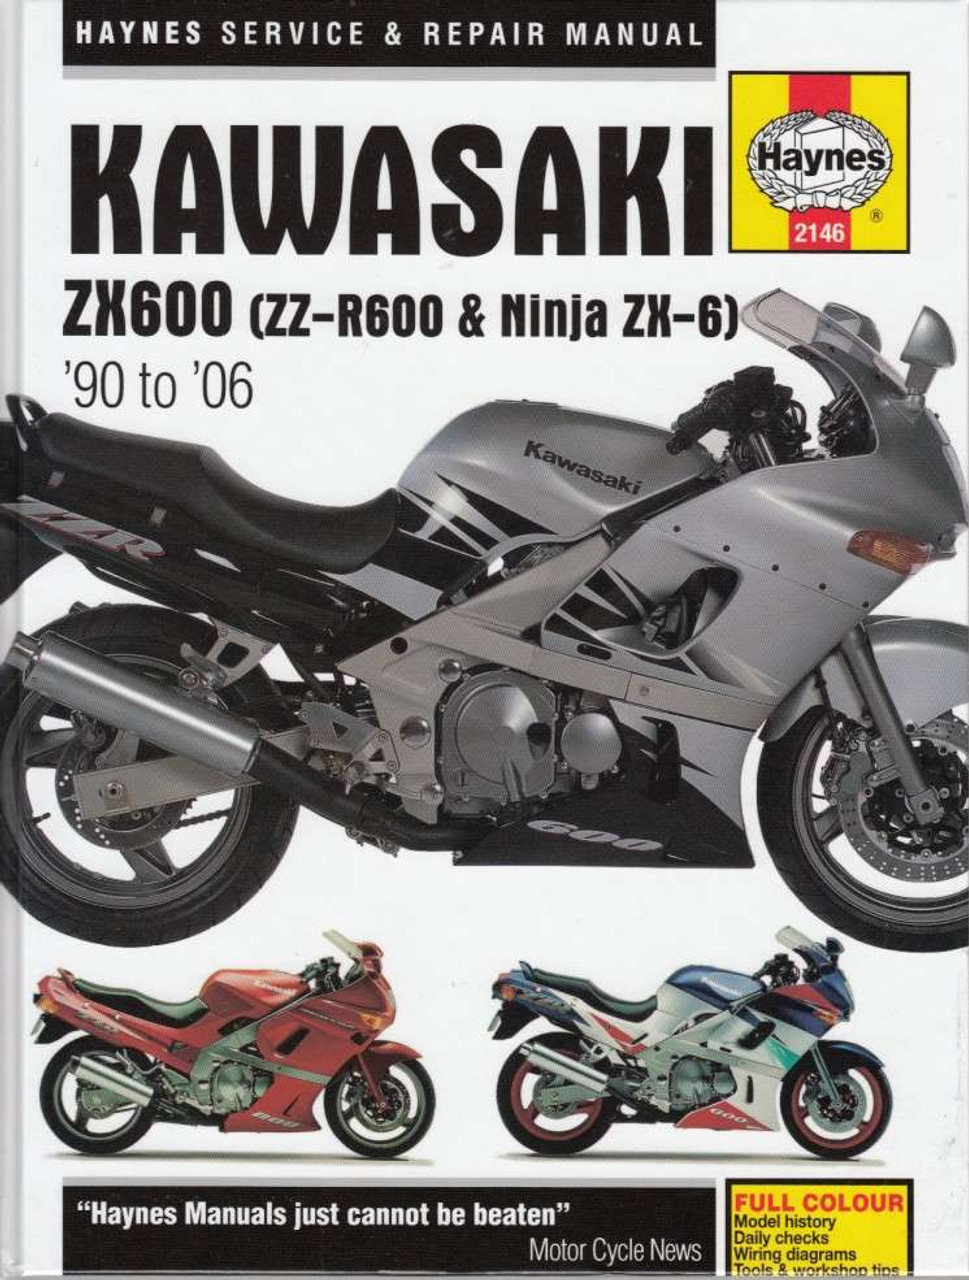 2019 Kawasaki Ninja 650 Service Manual